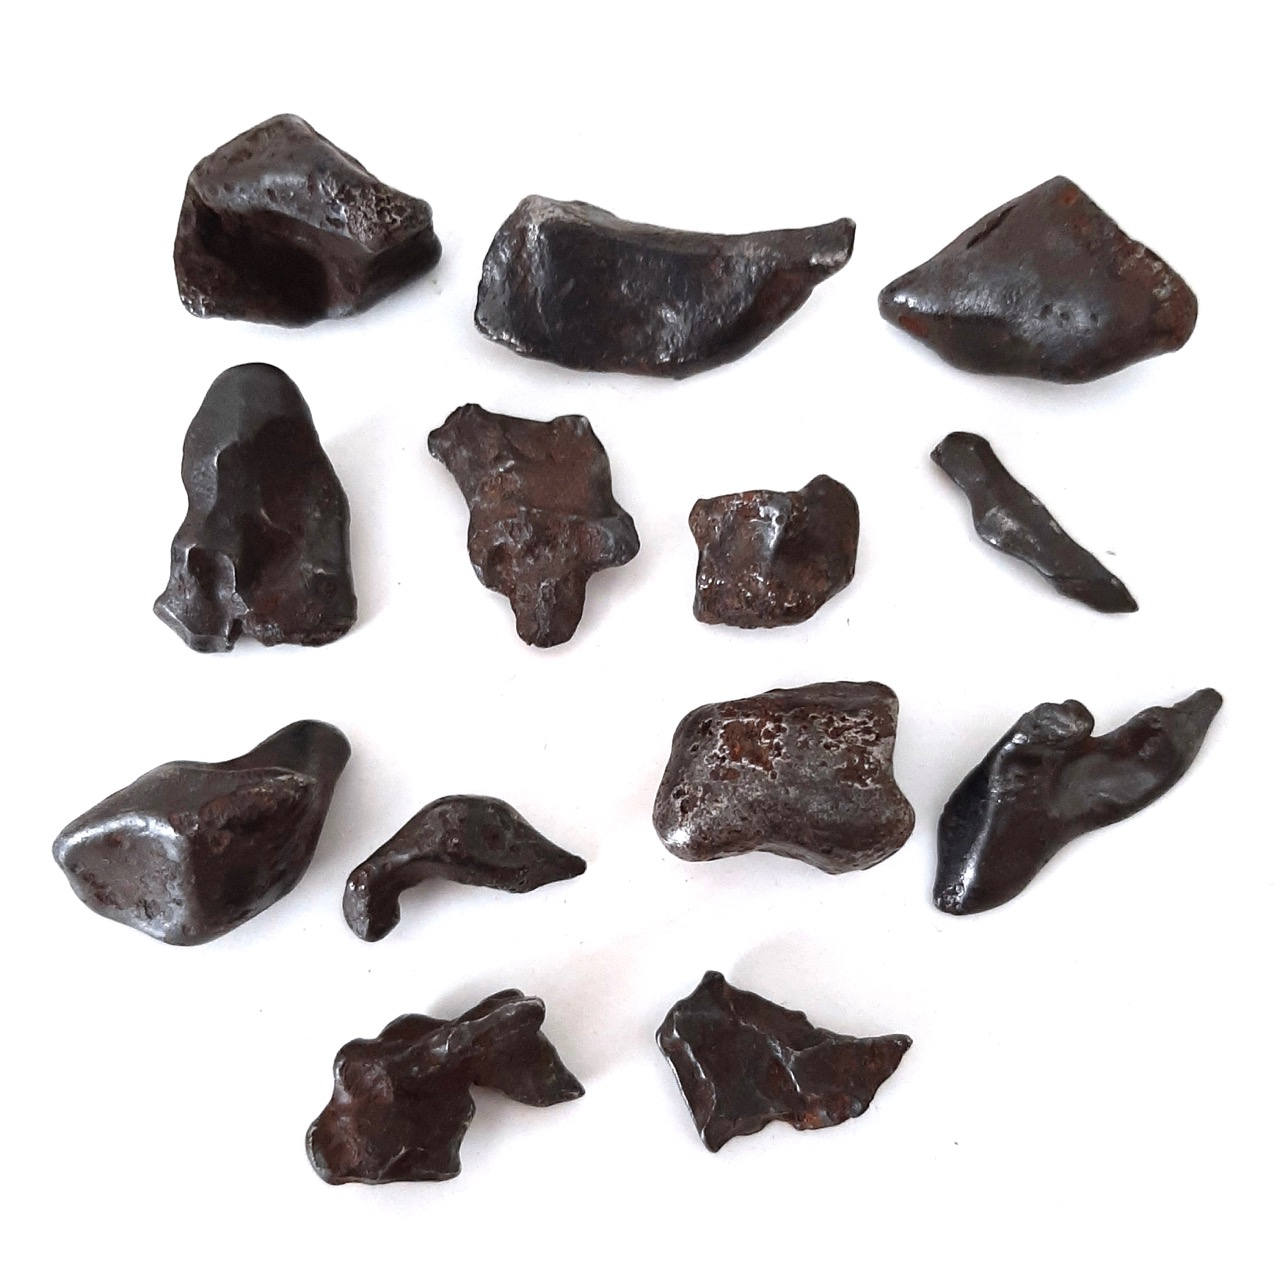 Sikhote Alin meteorite. 13 pieces.